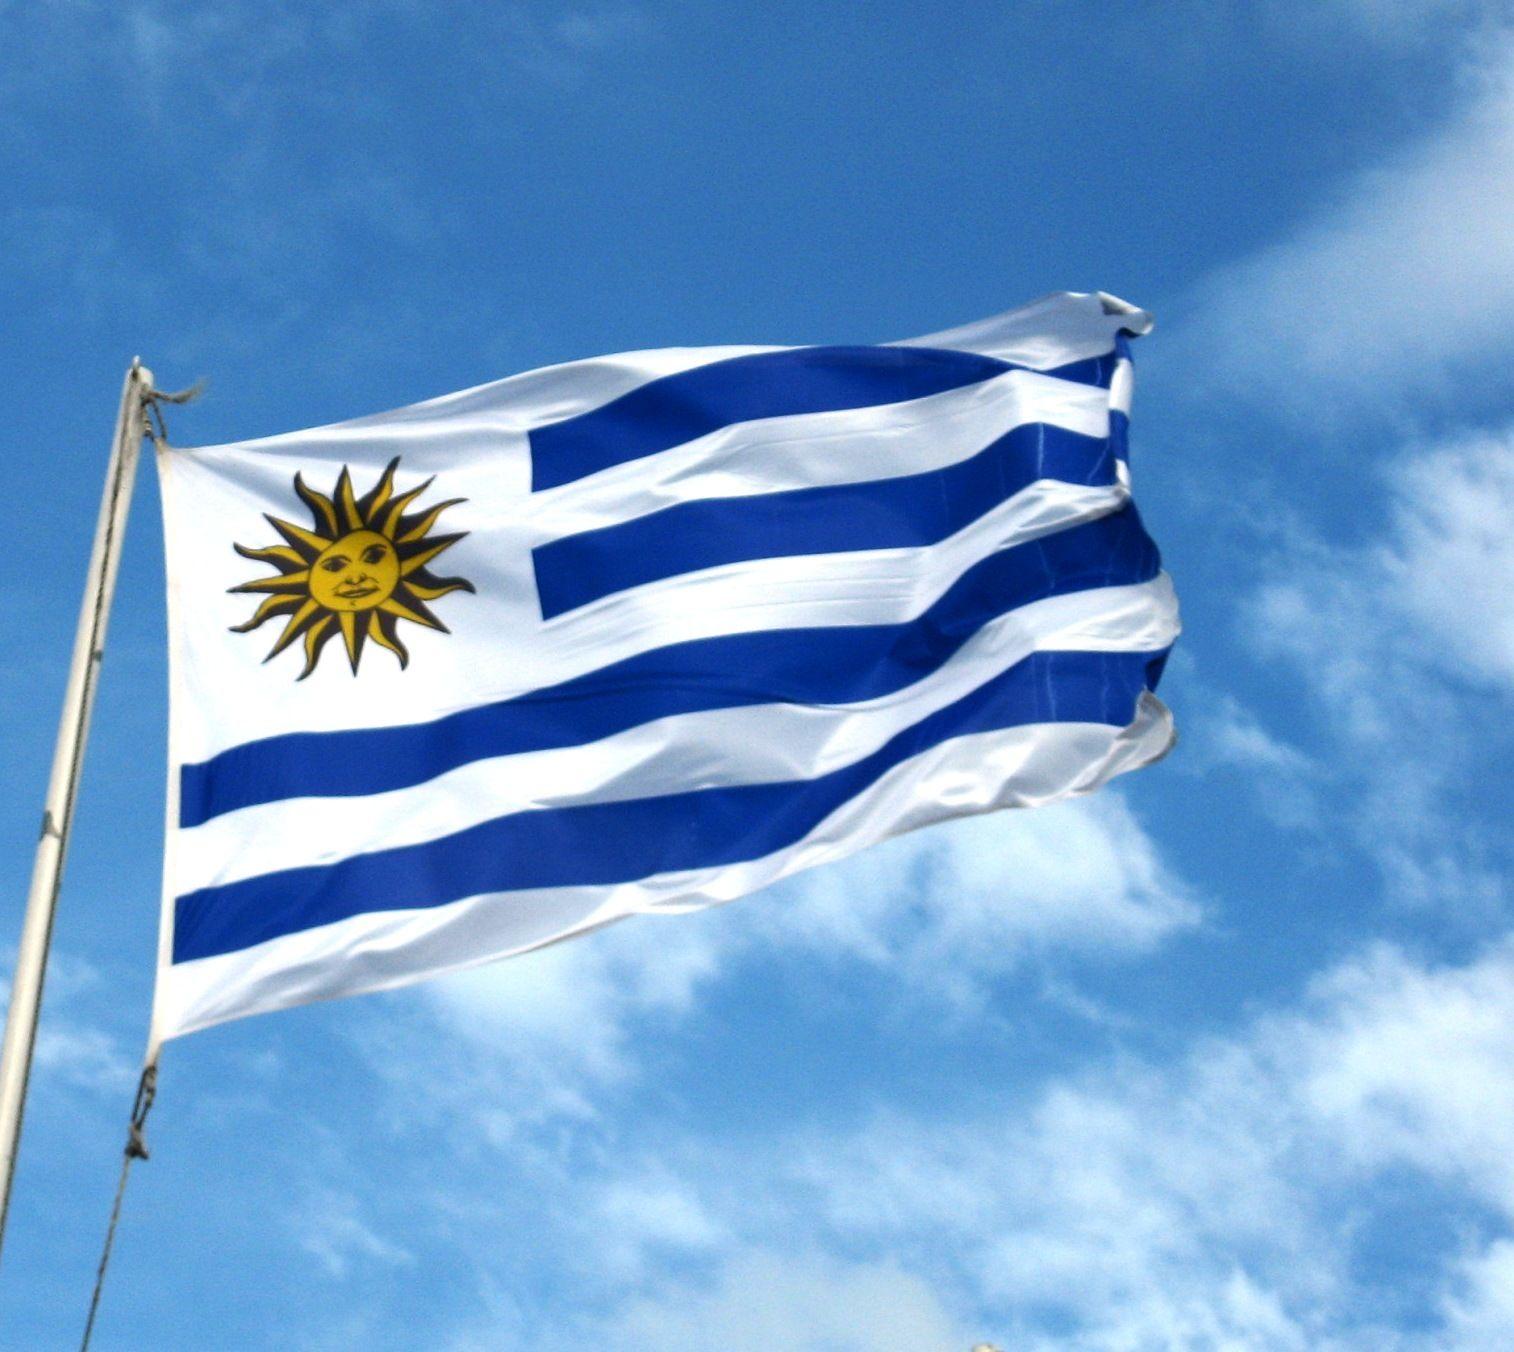 Uruguay Flag Uruguay Flag Pictures Uruguay Pinterest - Uruguay flag